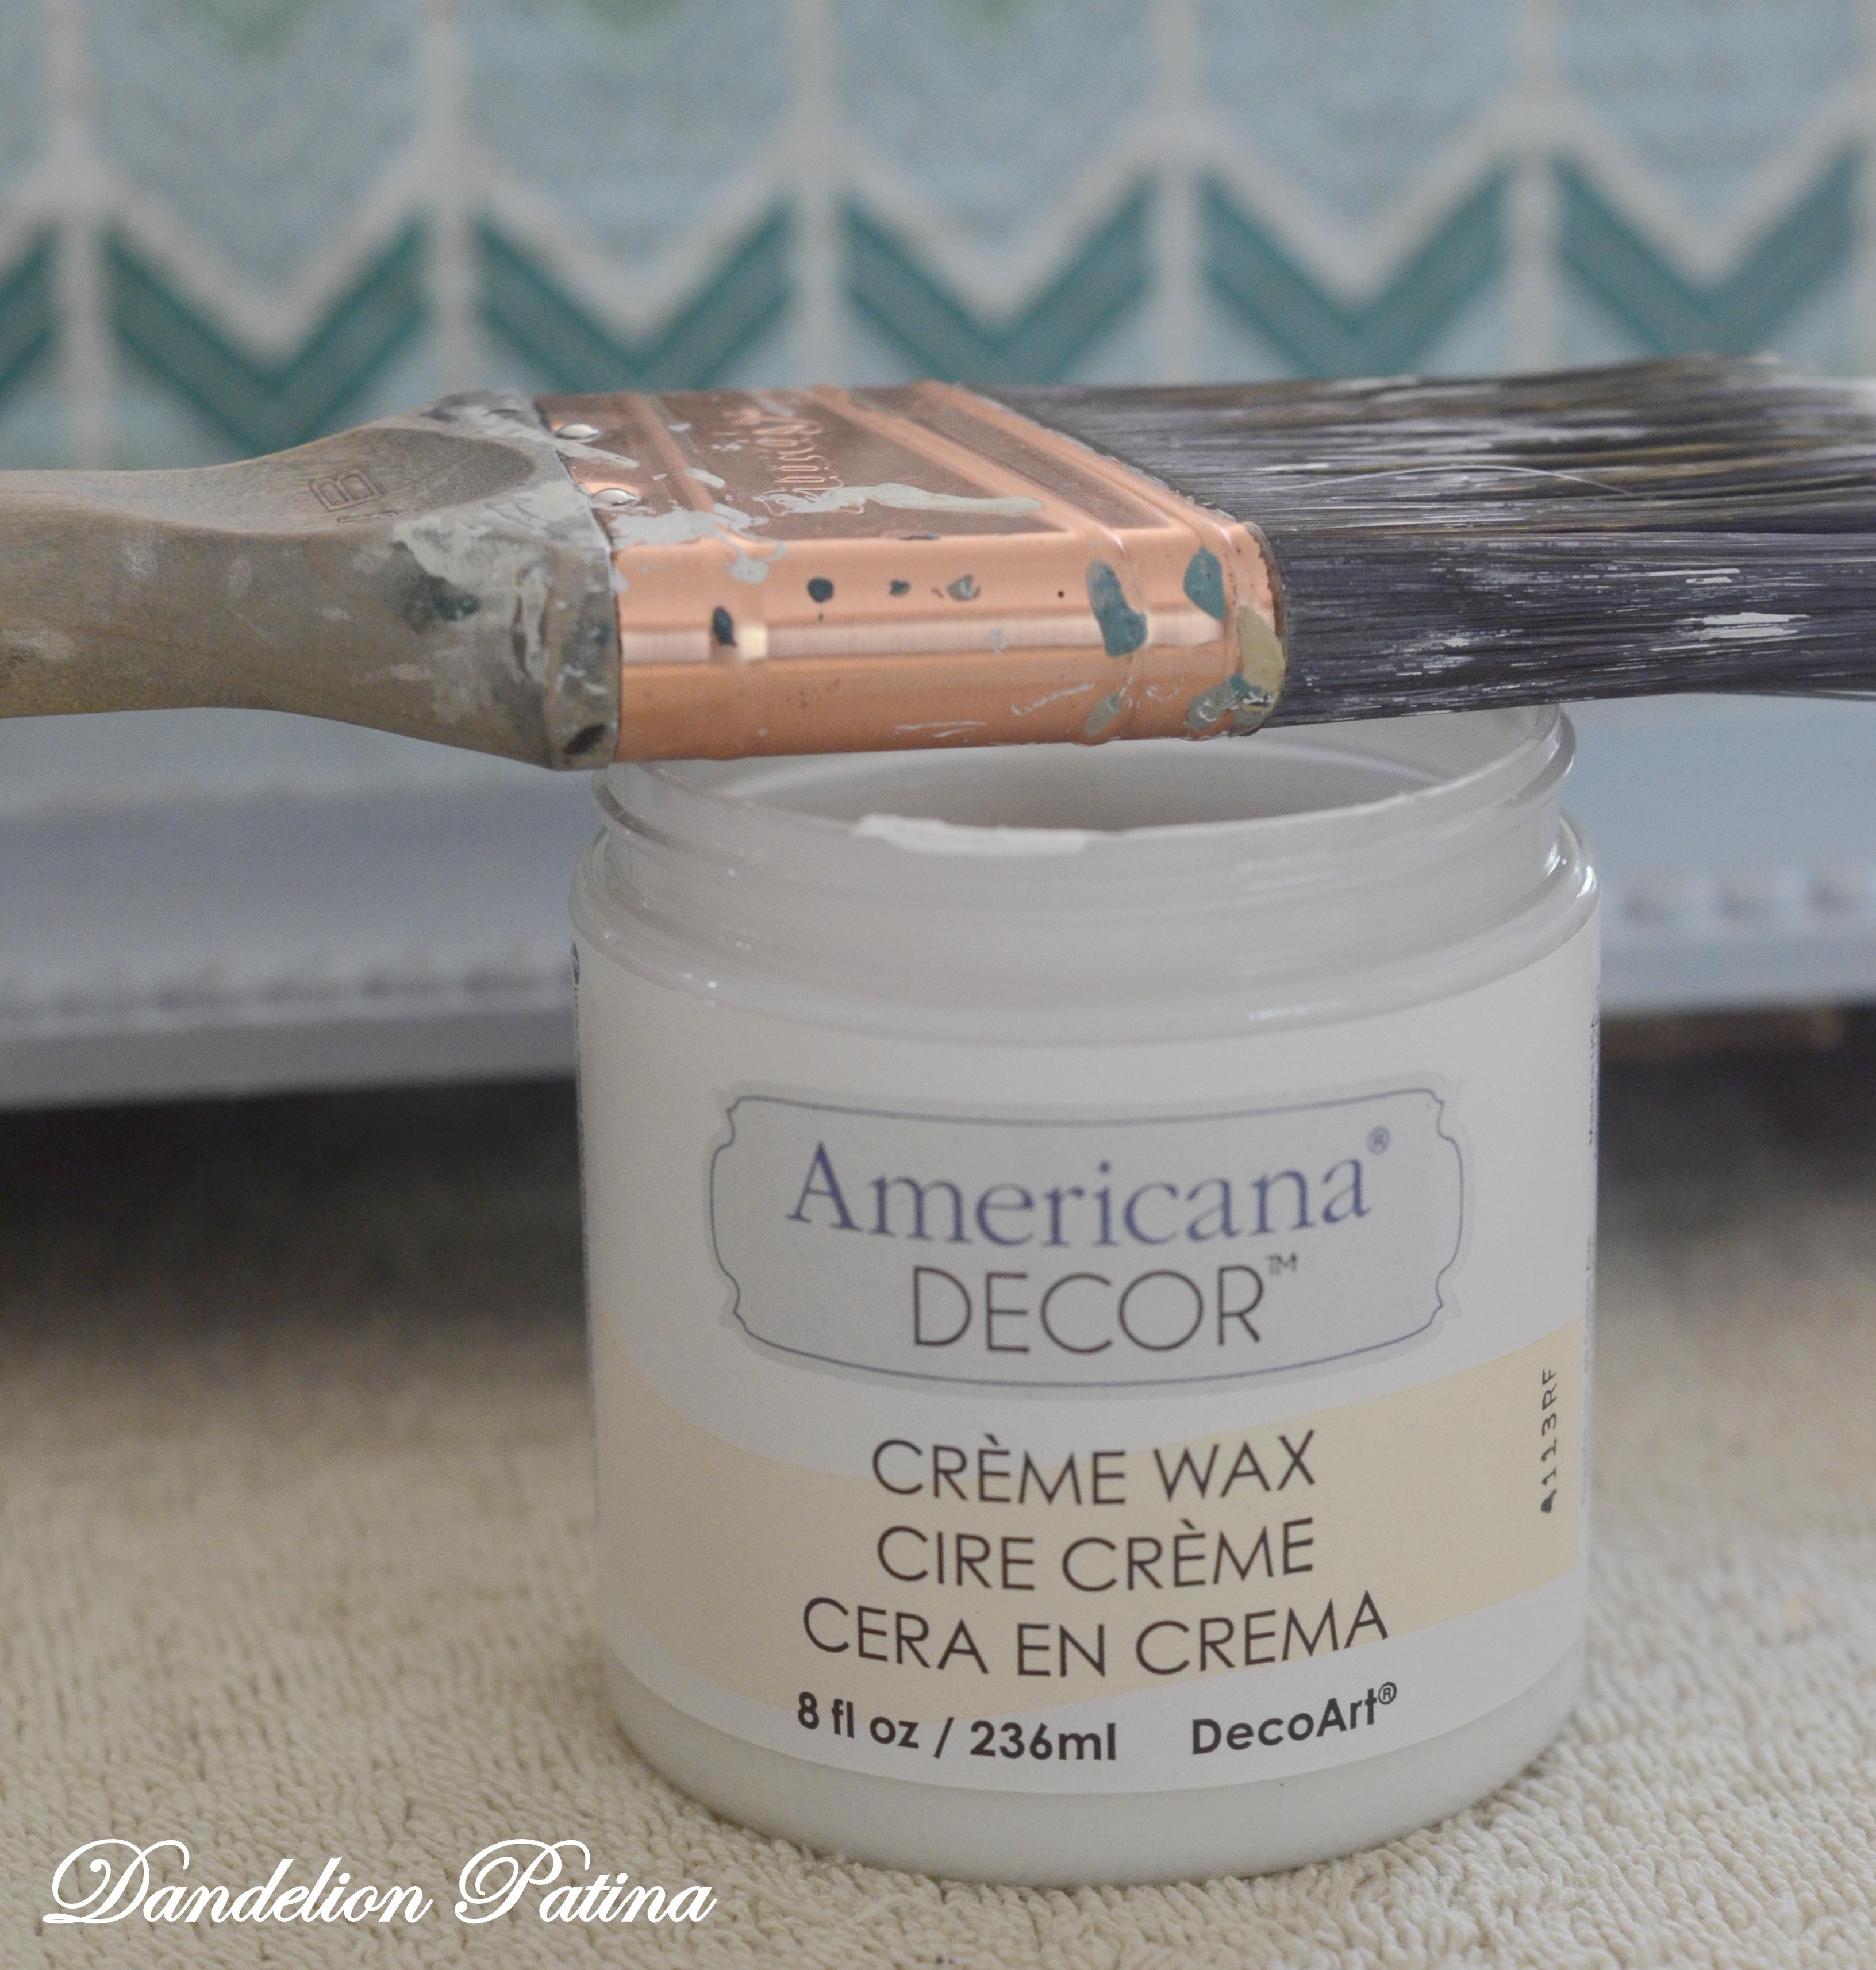 americana creme wax